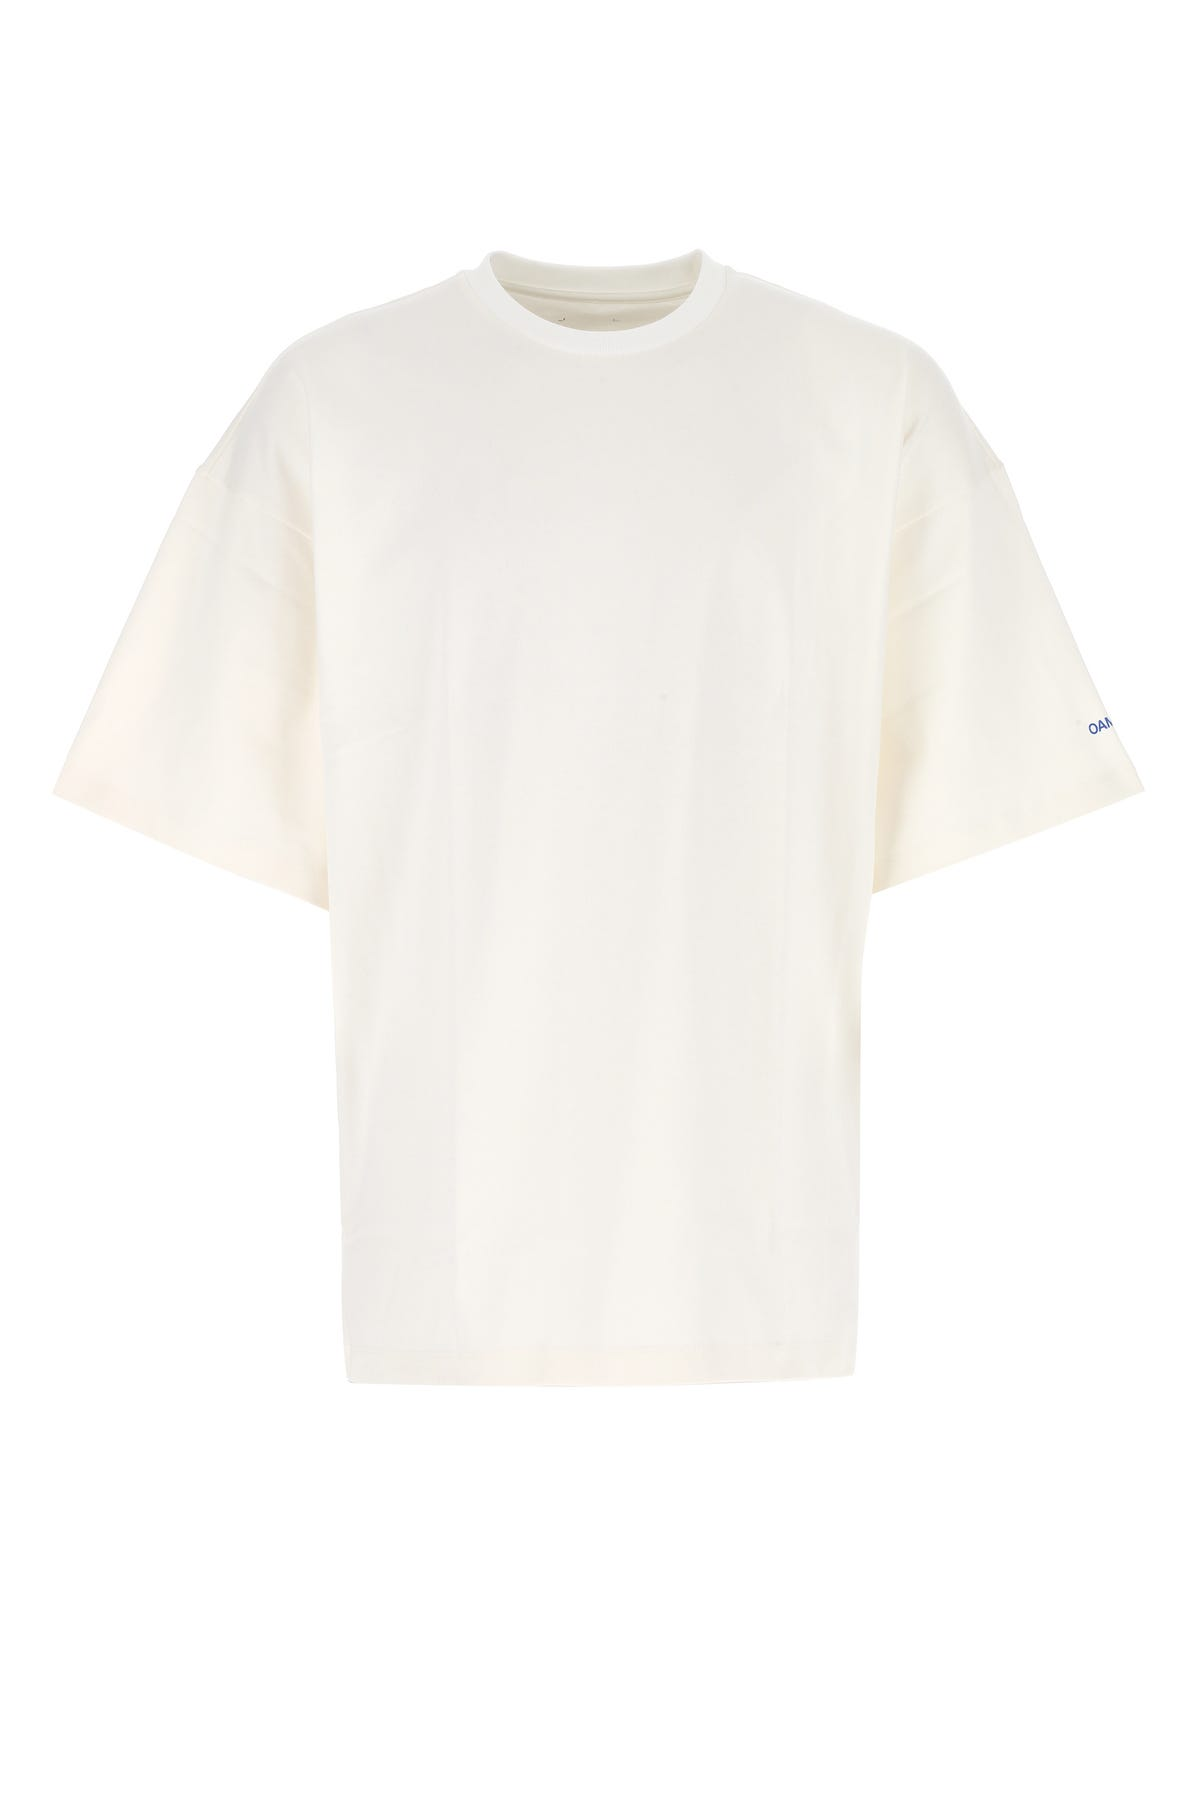 Oamc T-shirts ANTIQUED PINK COTTON T-SHIRT  PINK OAMC UOMO S